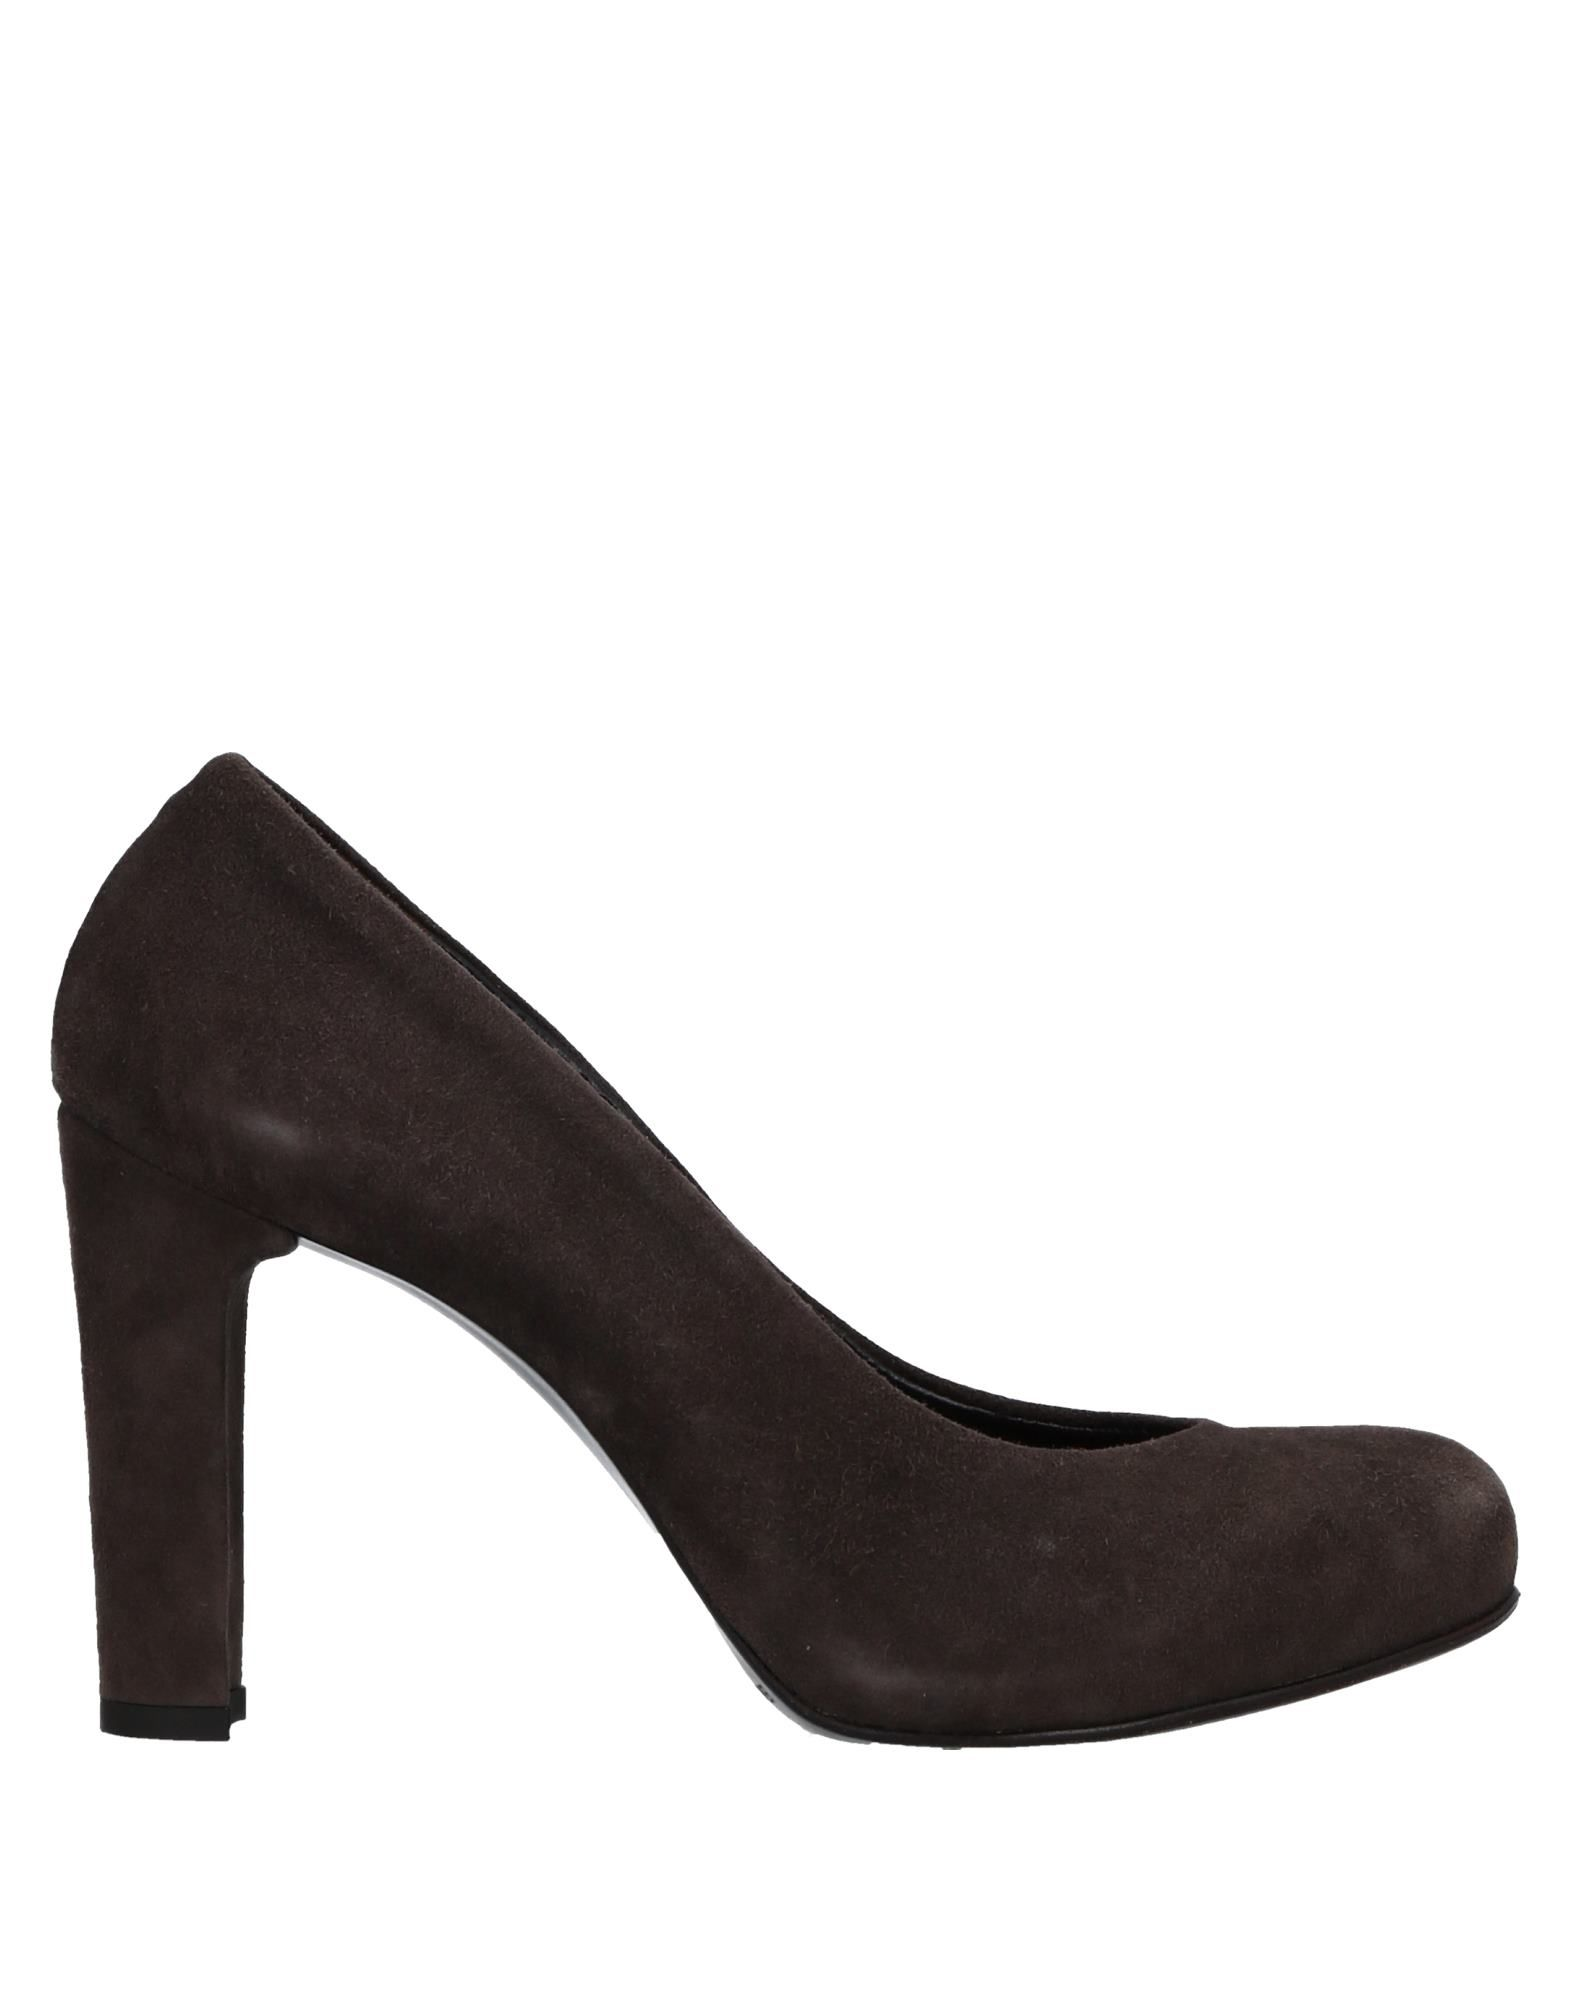 Emanuela Passeri Pumps Damen  11538977TG Gute Qualität beliebte Schuhe